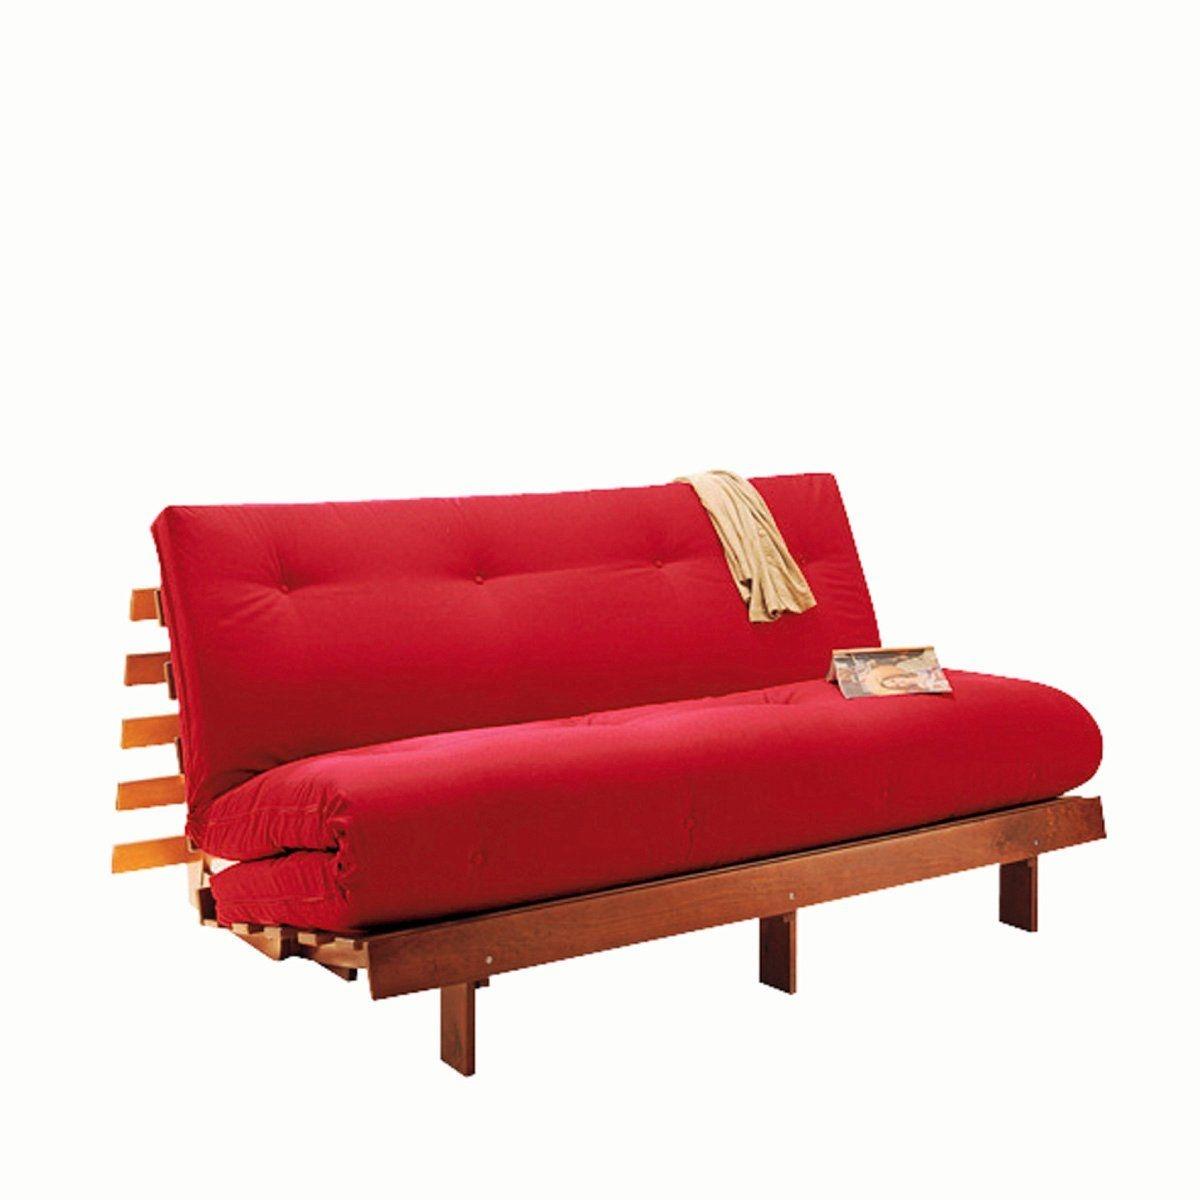 matelas futon latex pour banquette tha. Black Bedroom Furniture Sets. Home Design Ideas